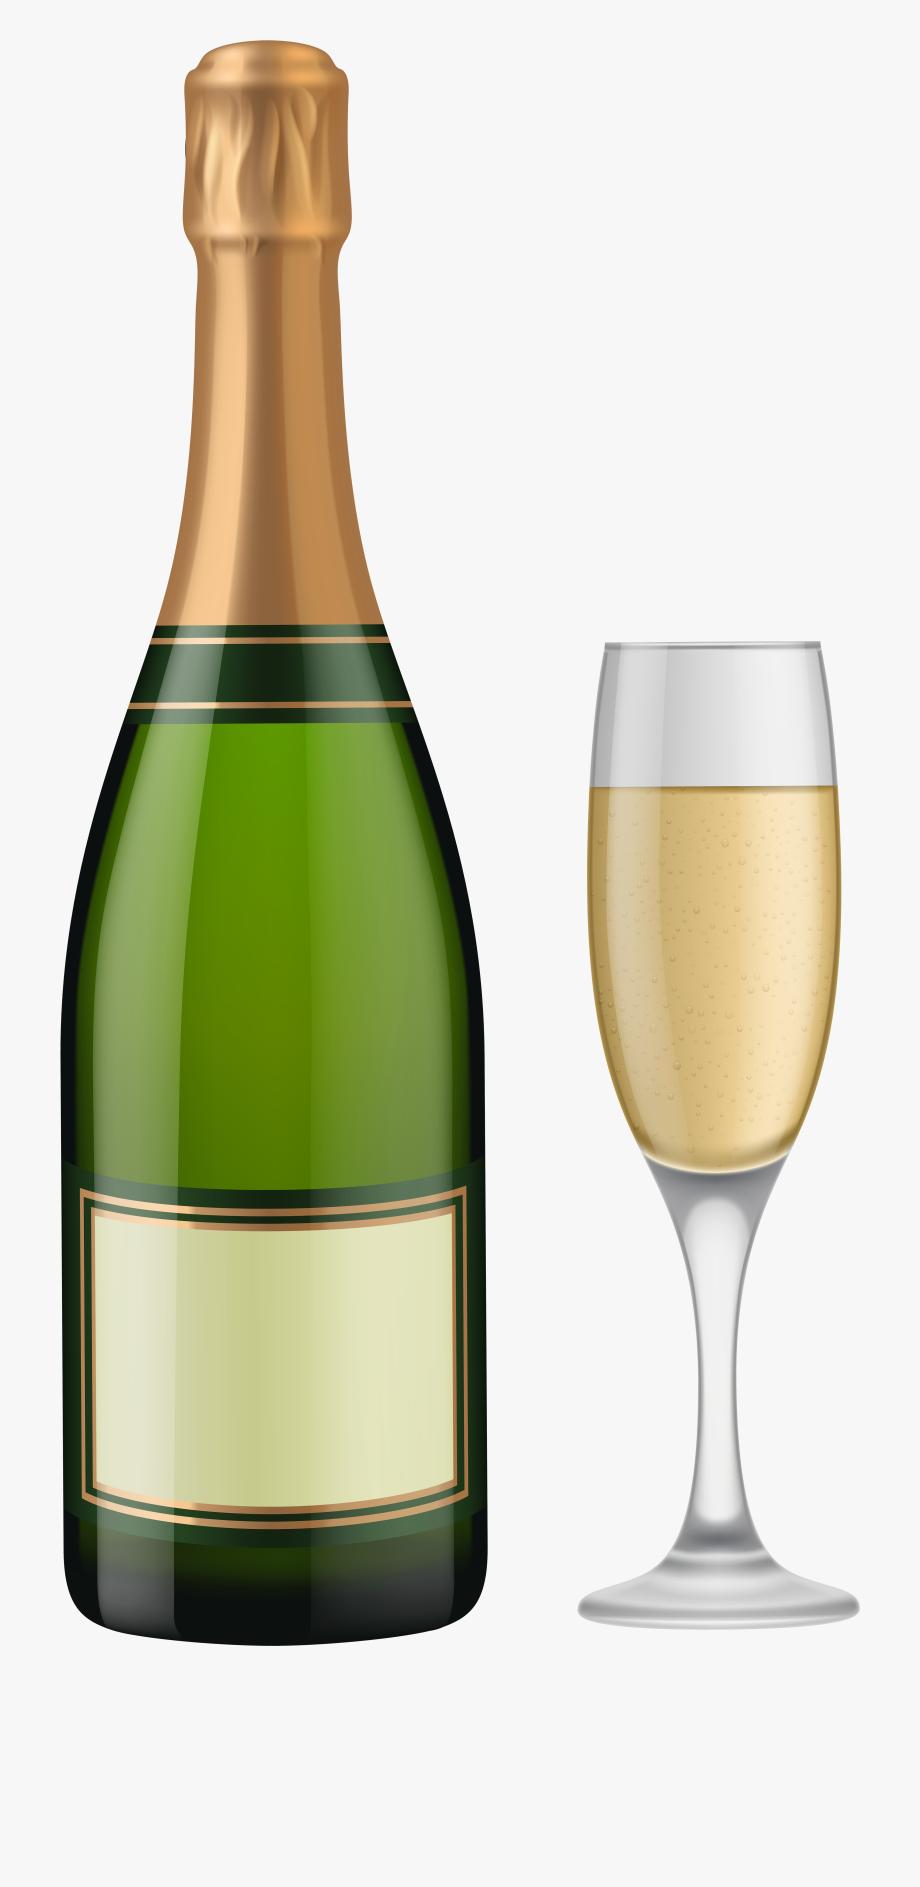 Bottle of champagne png. Champaign clipart clip art